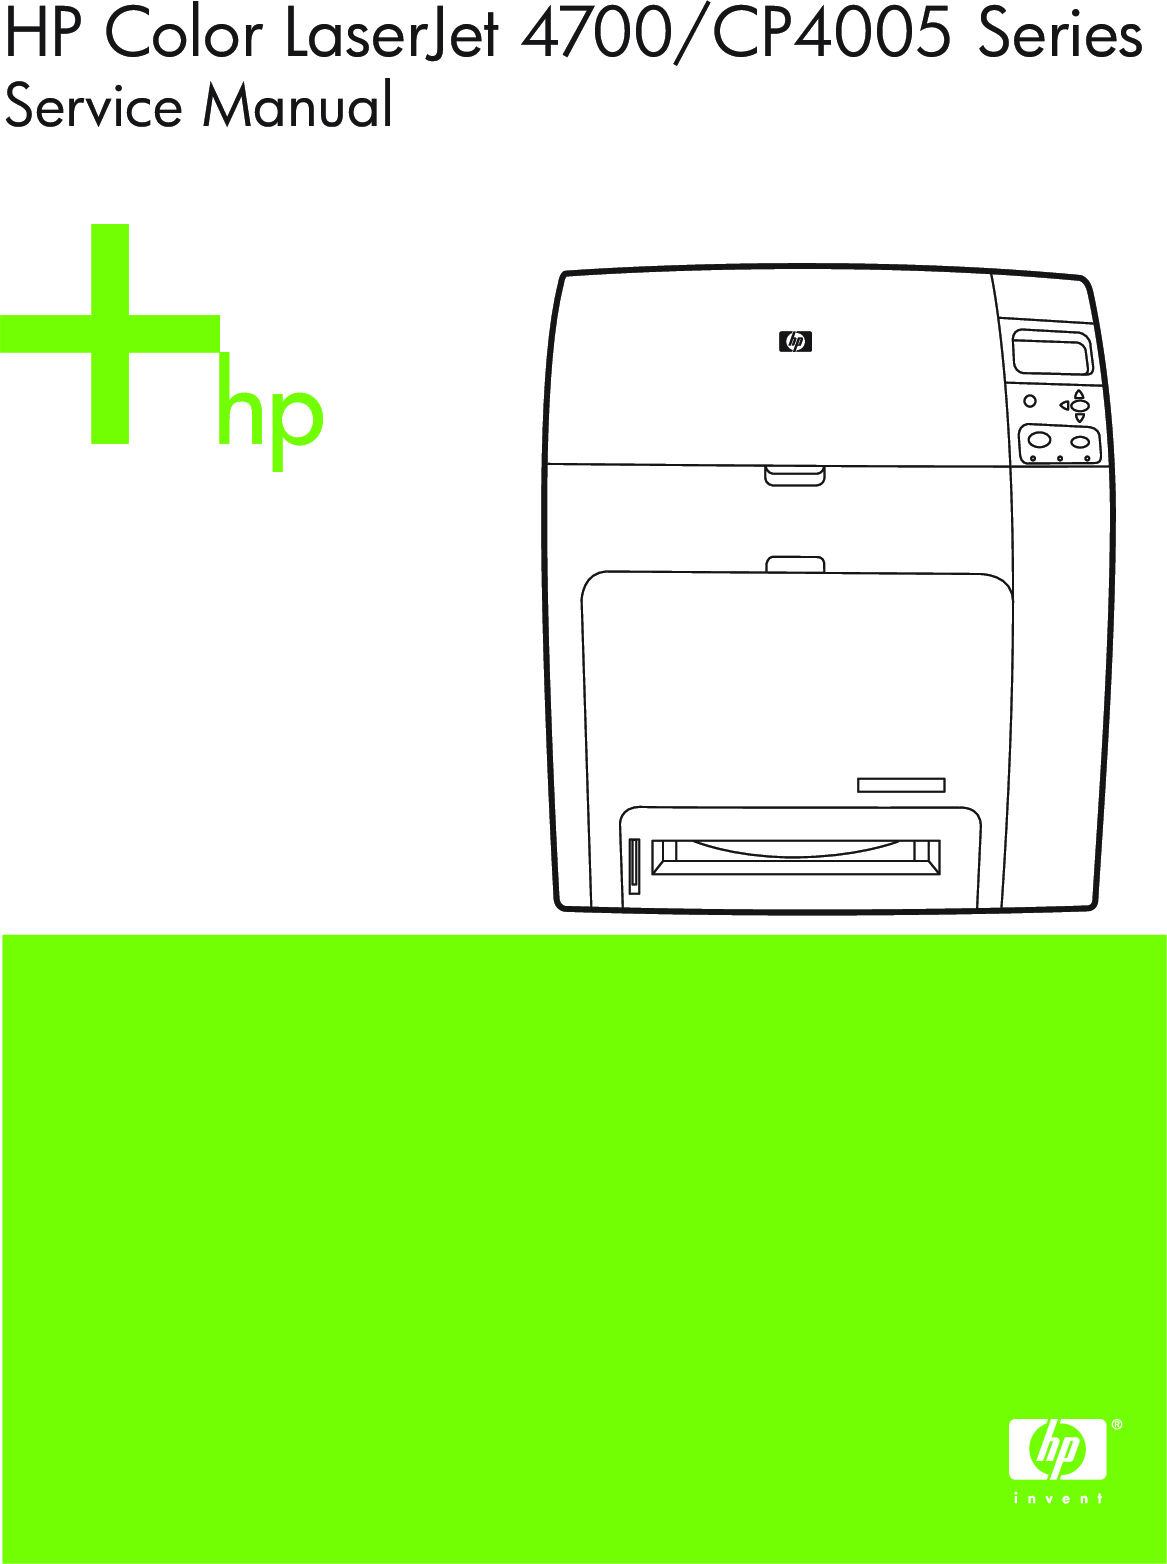 HP Color LaserJet 4700, CP4005 Series Service Manual. Www.s manuals.com.  Manual